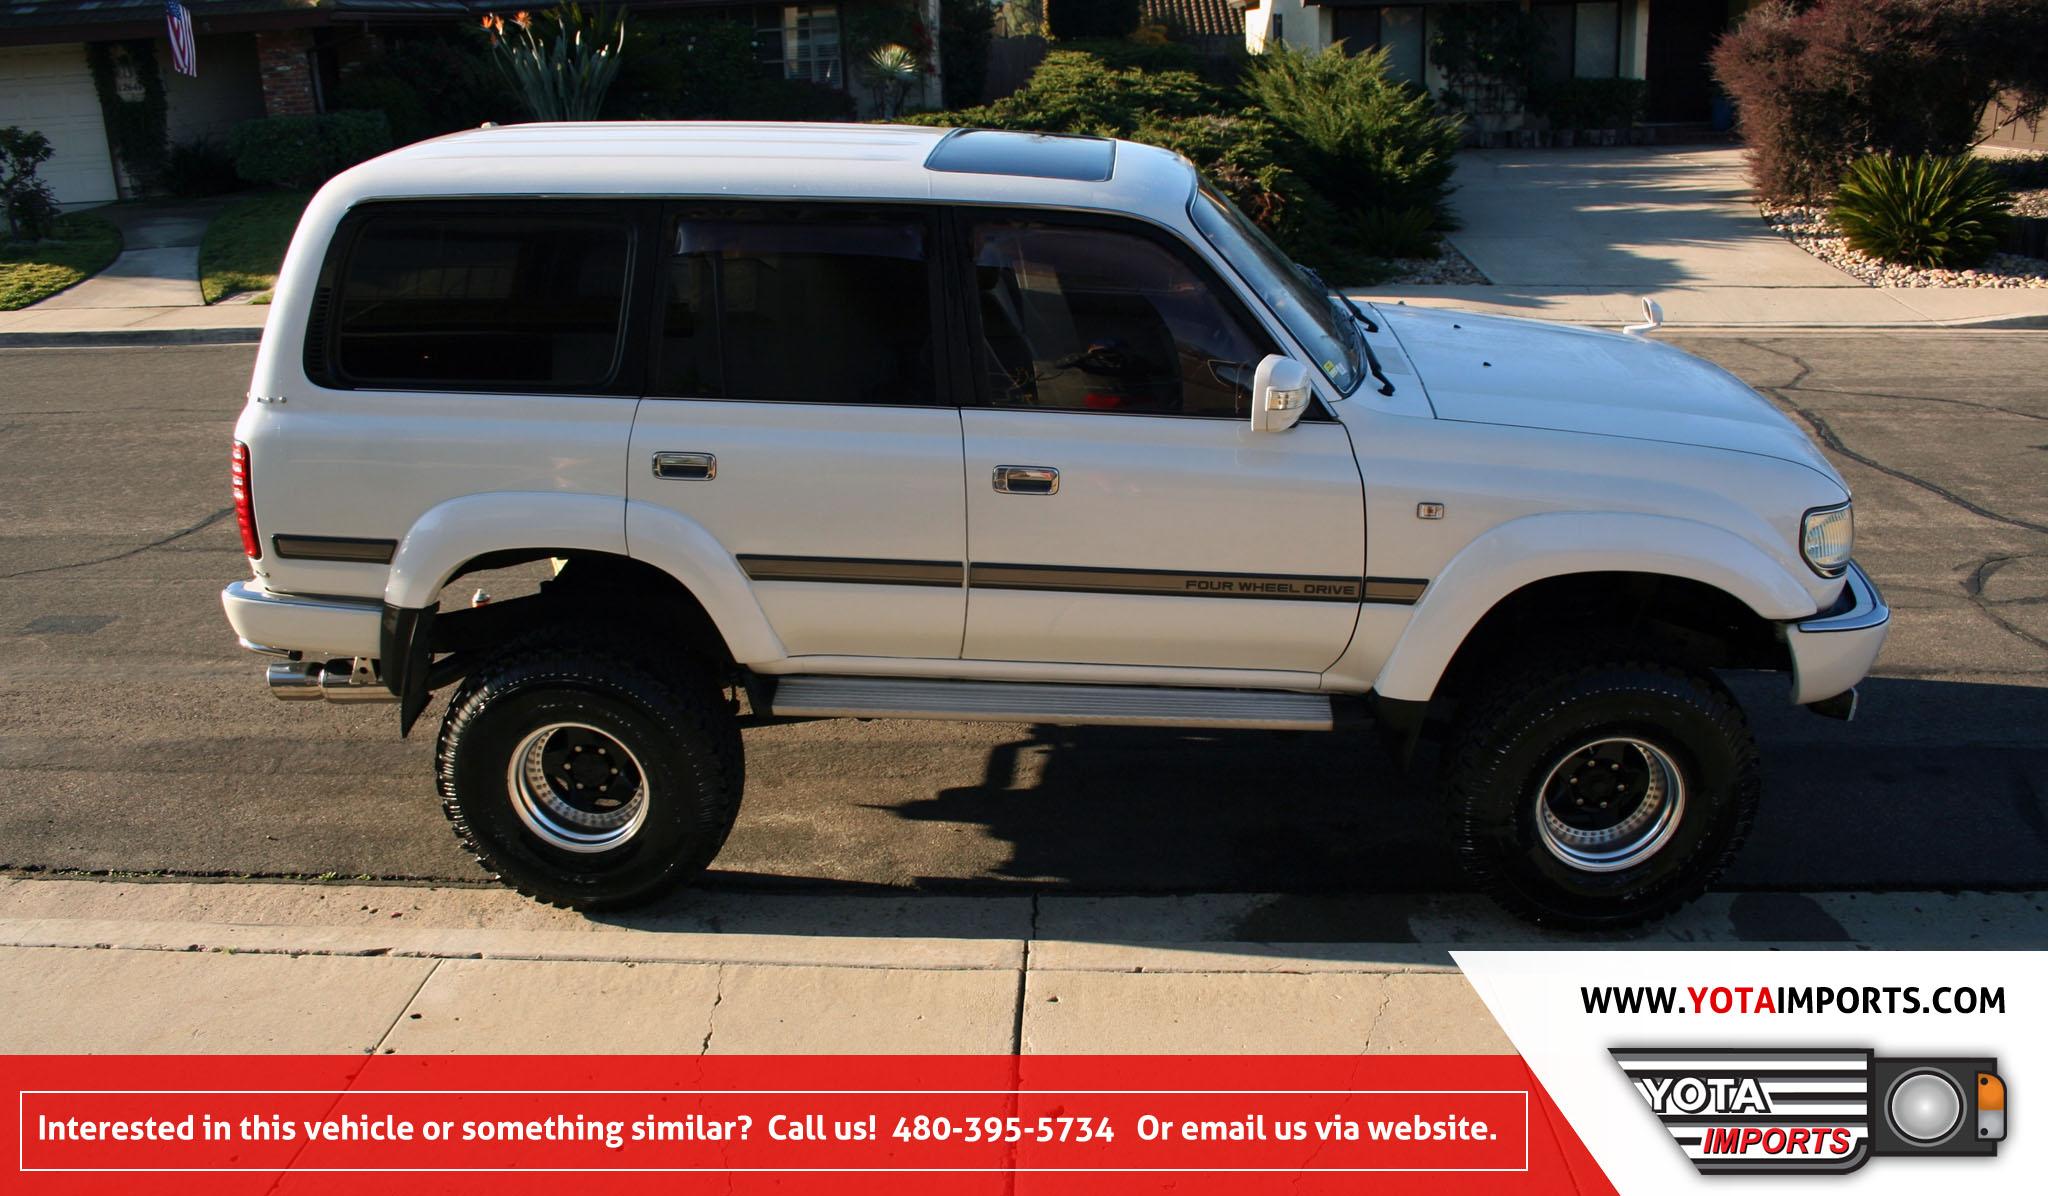 1992 Toyota Land Cruiser – HDJ81 Turbo Diesel – Yota Imports